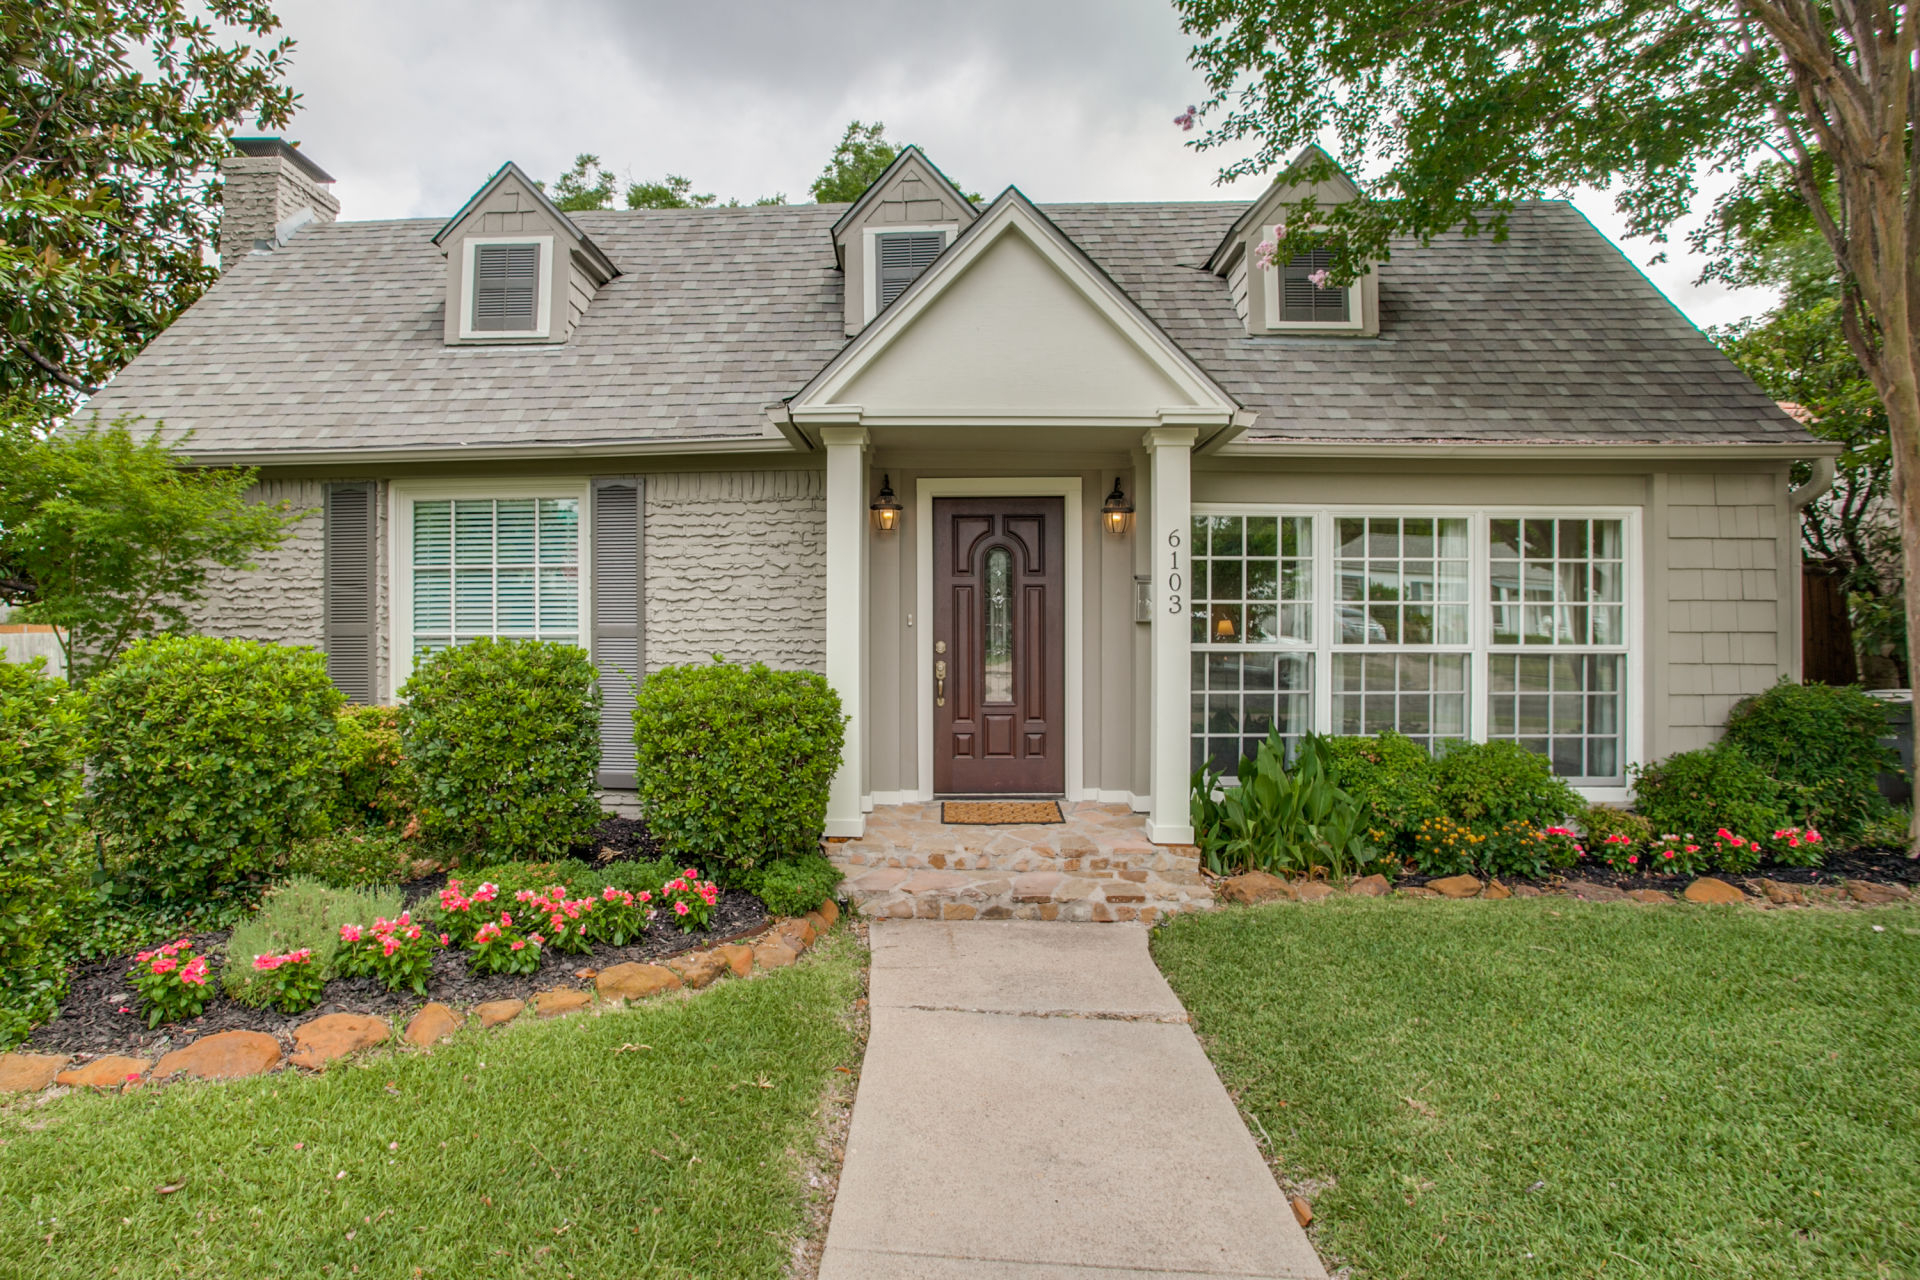 6103 Martel Ave – Dallas, TX  **OPEN HOUSE** Sunday, 10/28/18 2-4pm